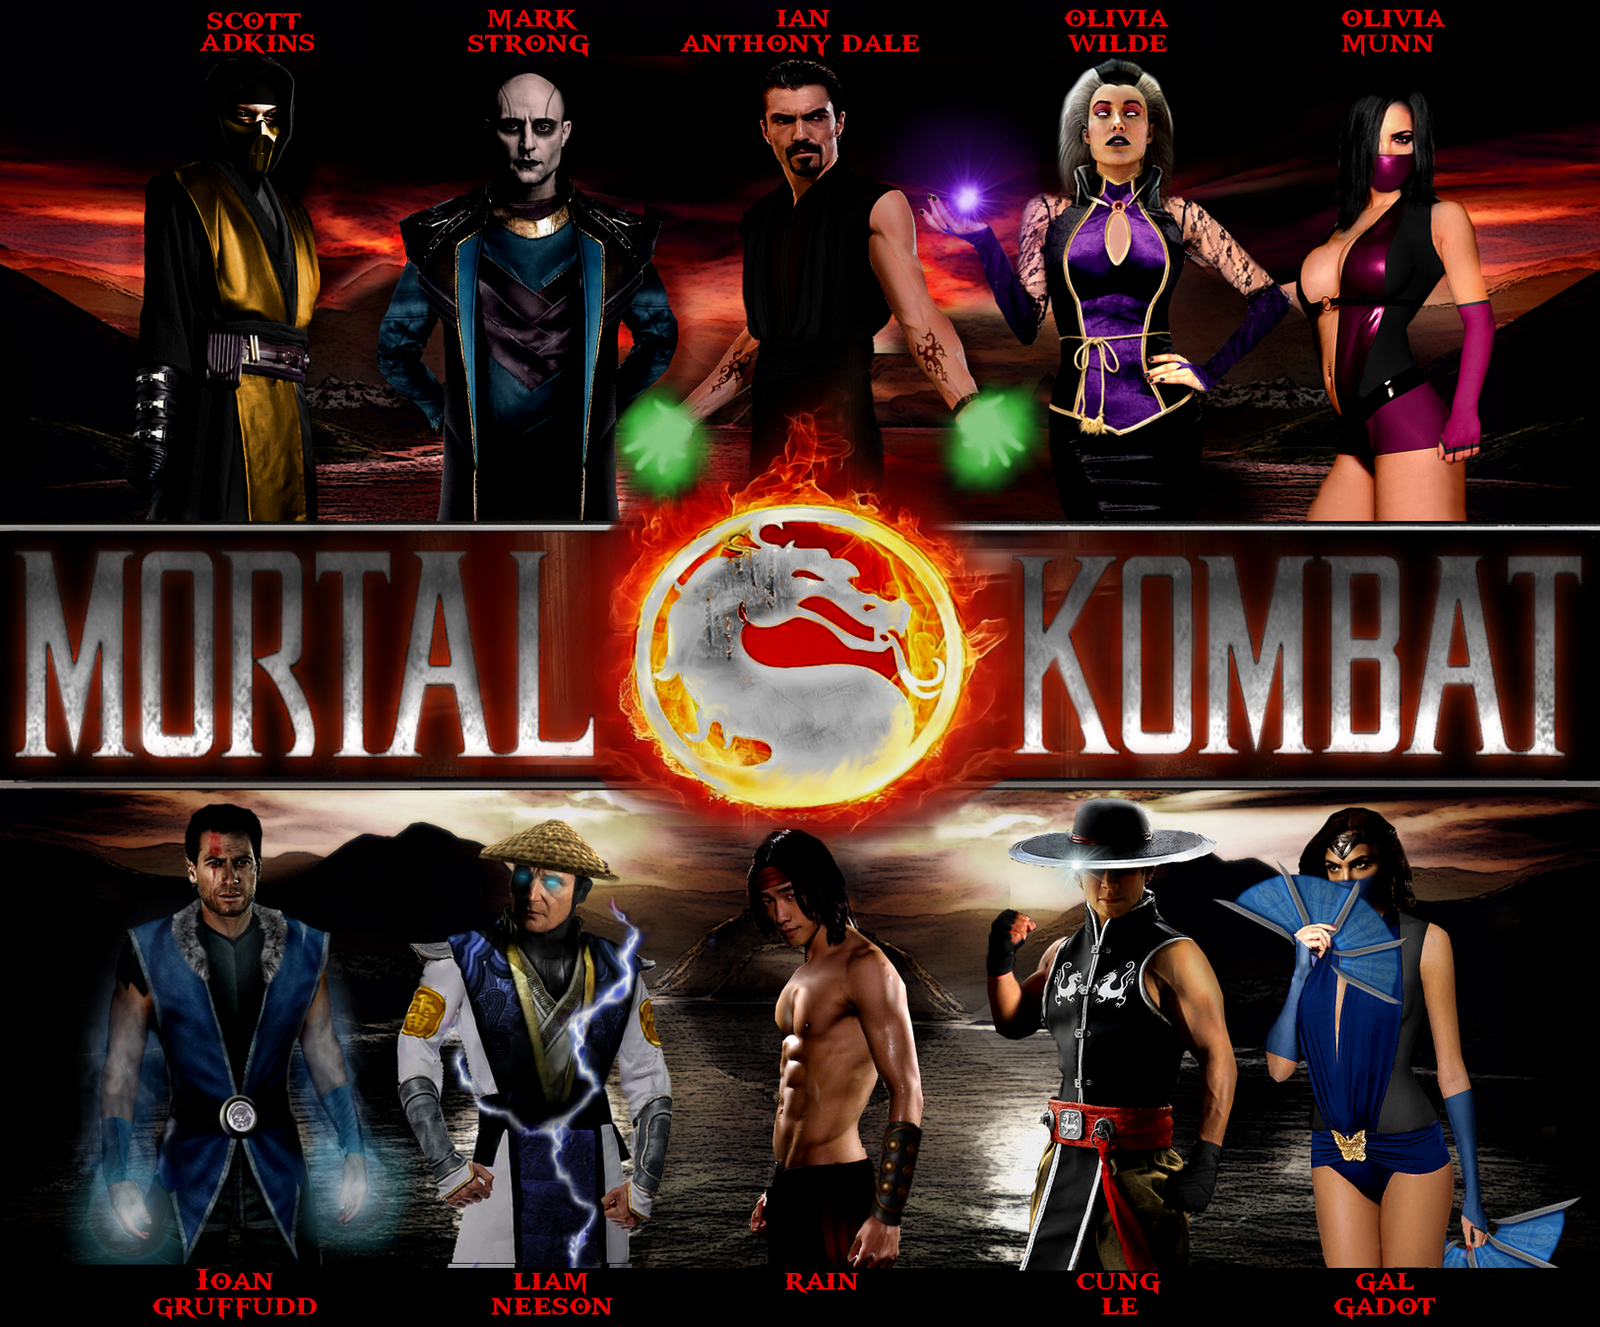 Mortal Kombat 2011 video game  Wikipedia